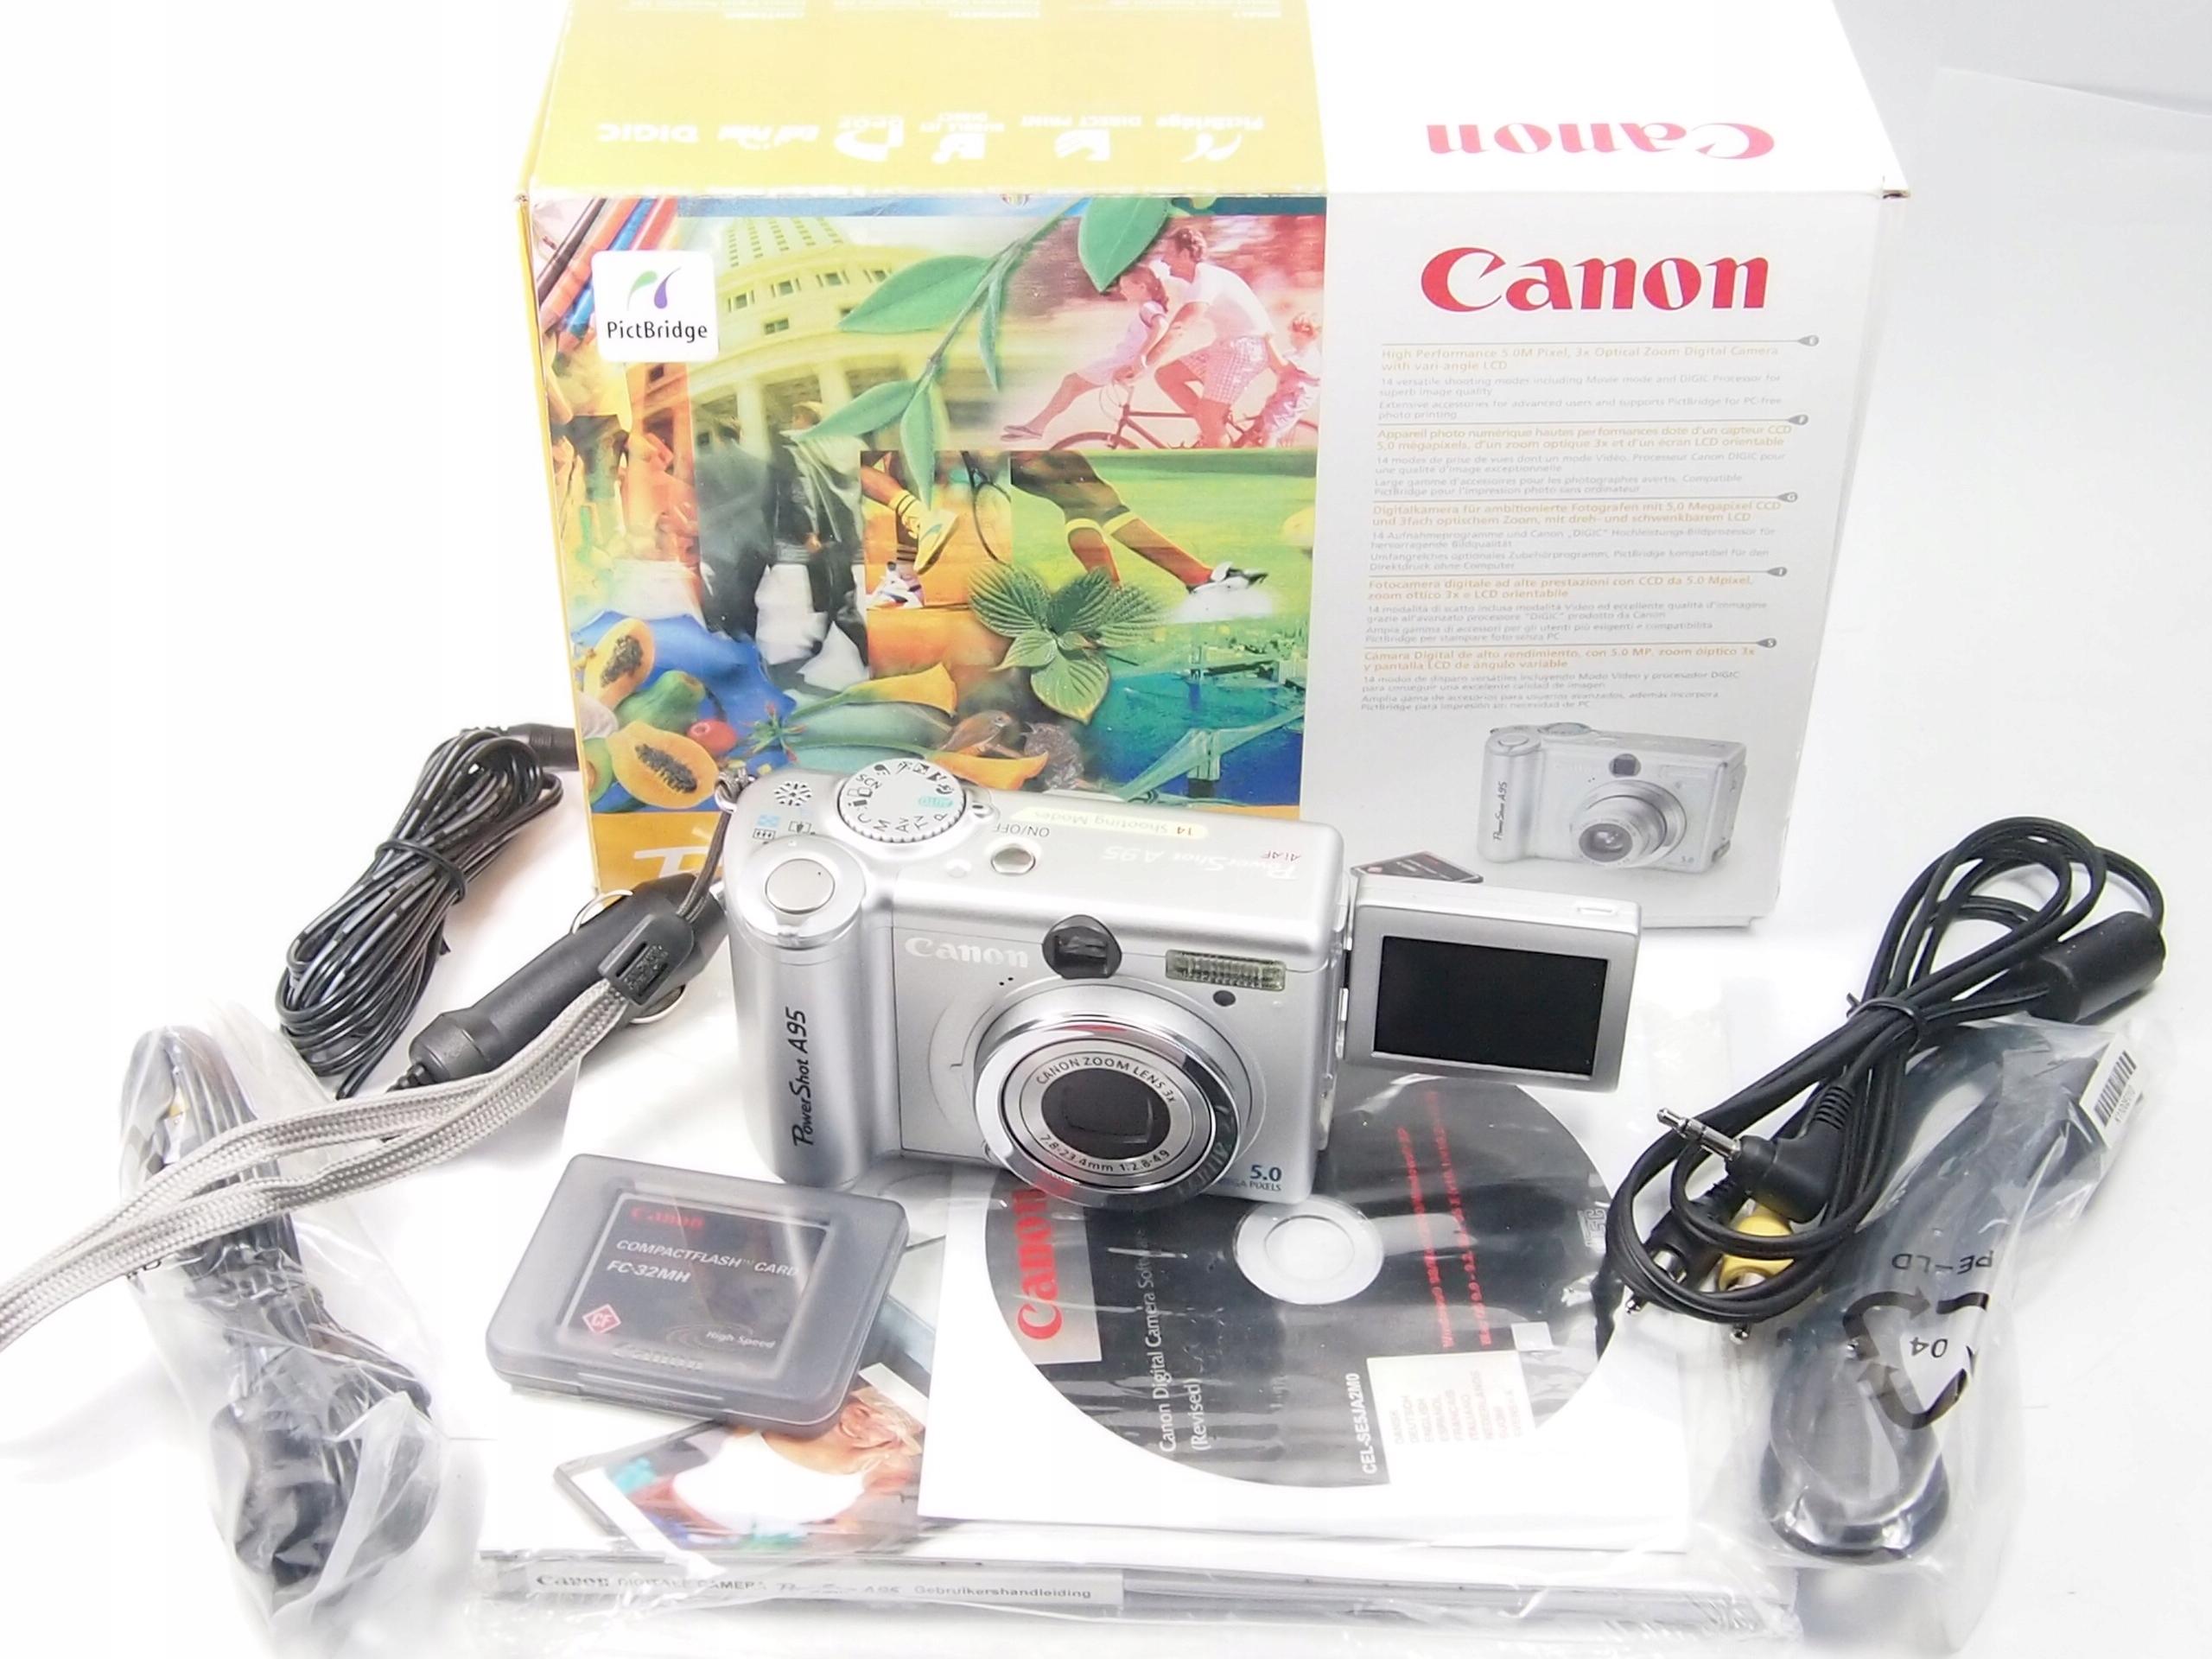 Aparat cyfrowy Canon A35 Power shot pełen komplet